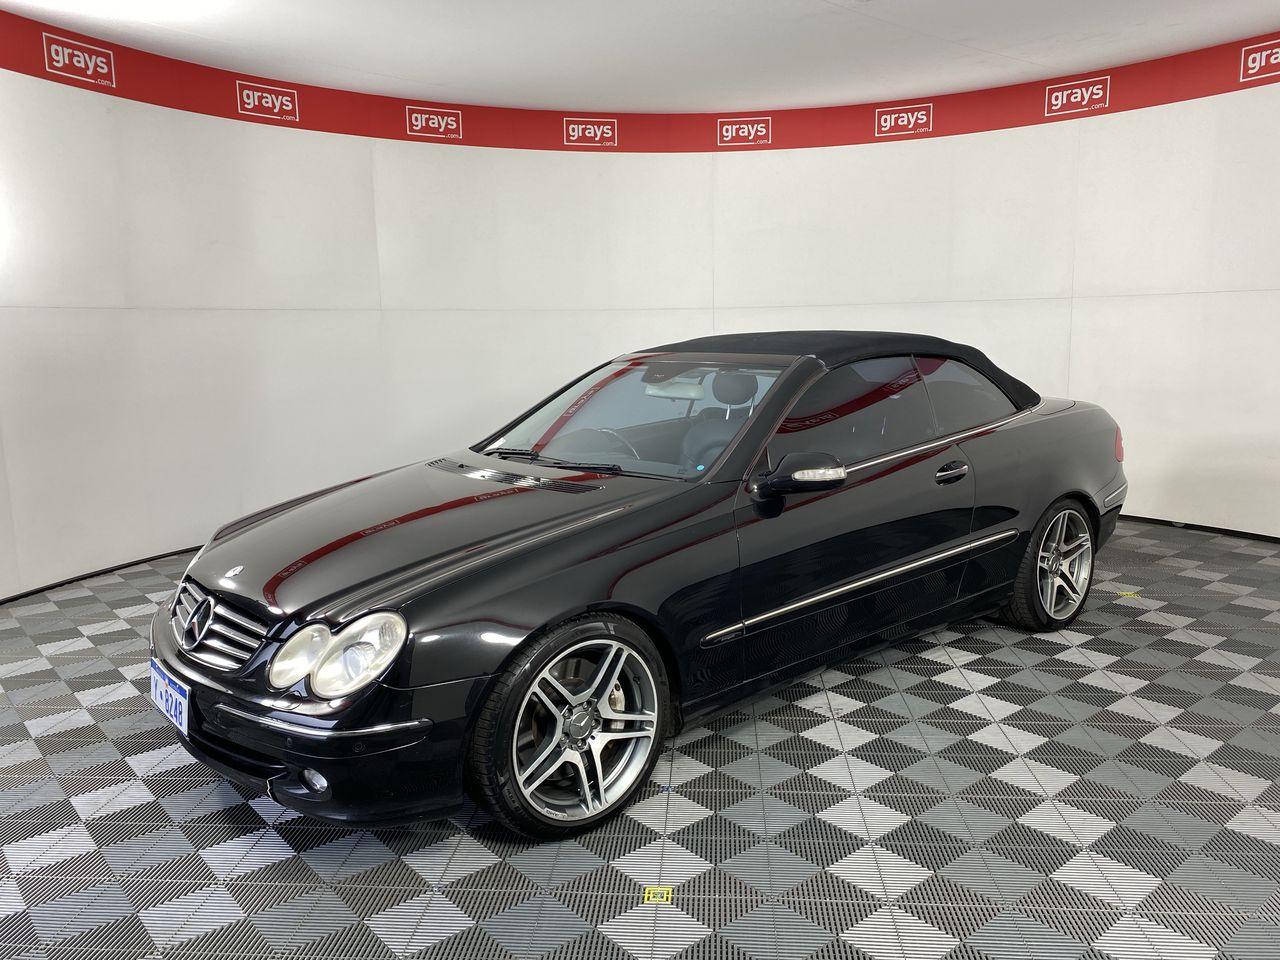 2004 Mercedes Benz CLK500 Avantgarde A209 Auto Convertible (WOVR-Inspected)